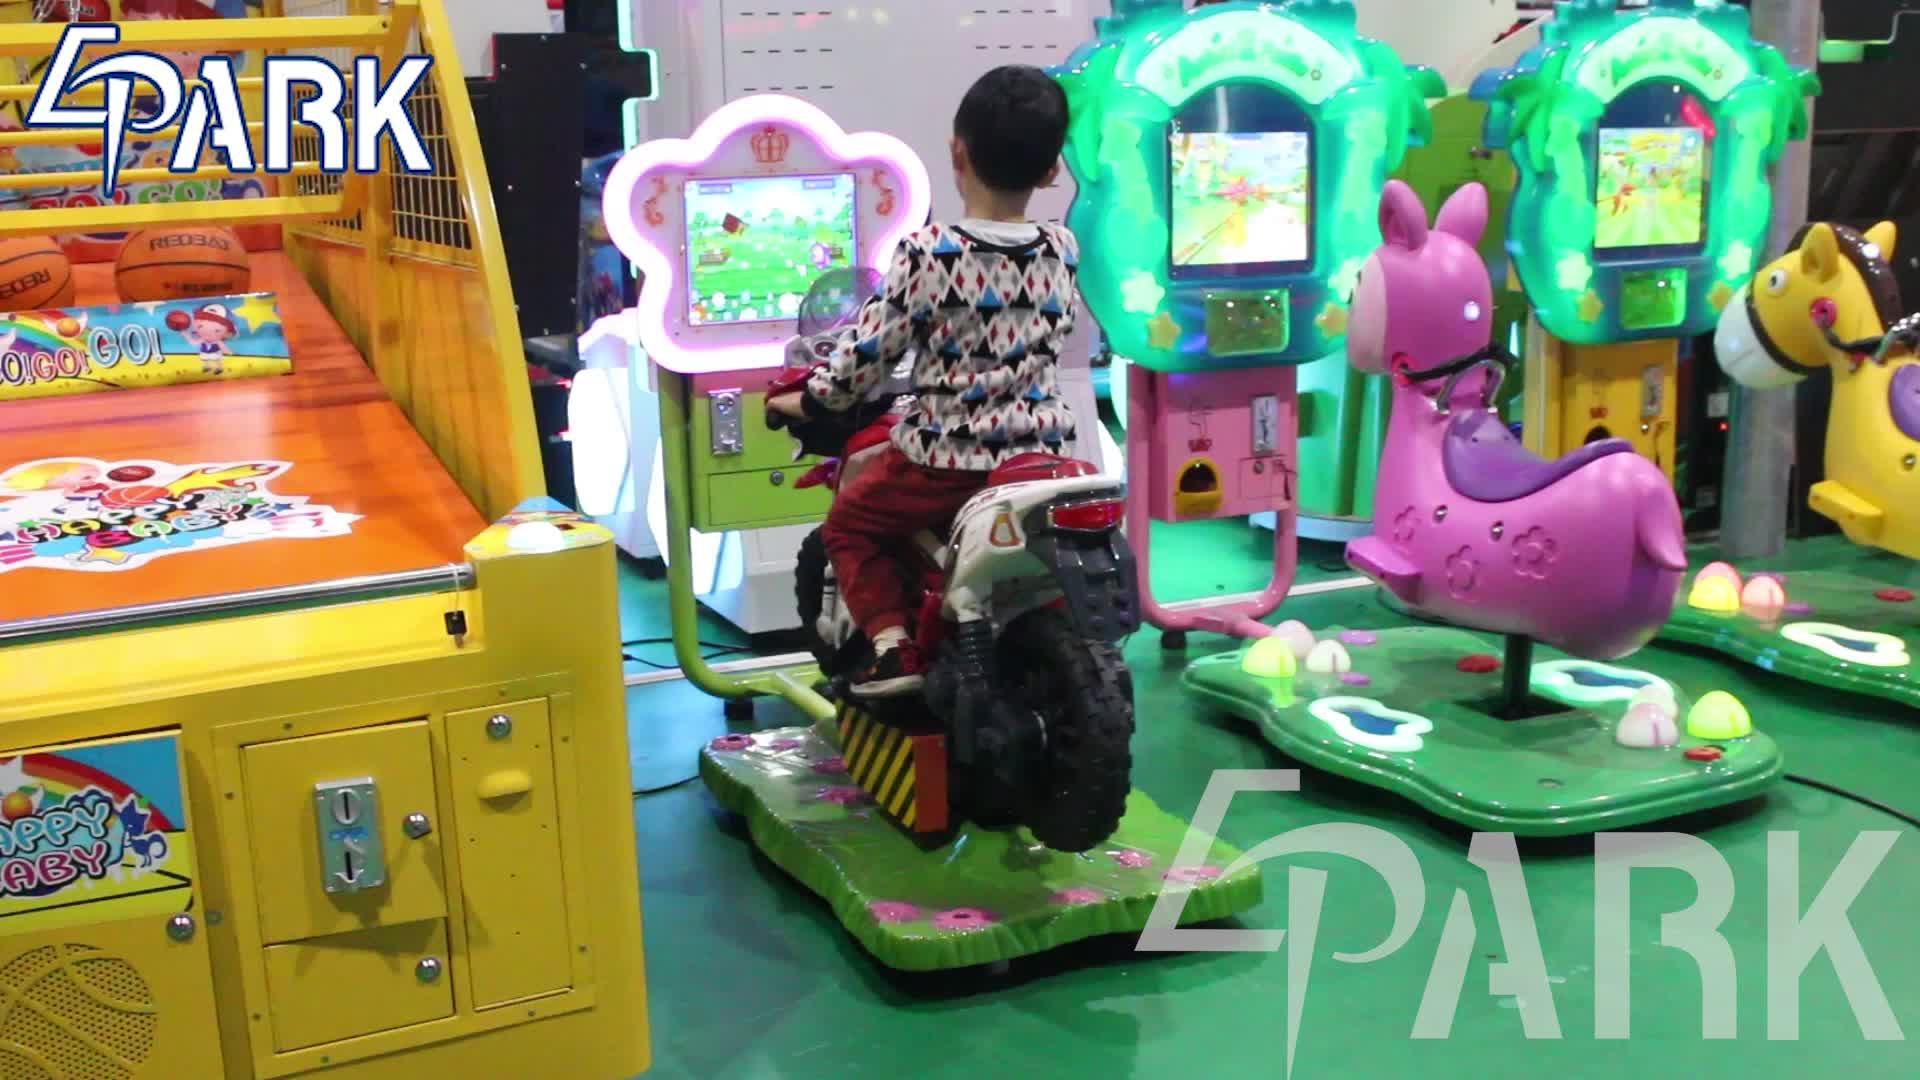 Indoor Sports Coin operated kids moto racing game simulation arcade racing car game machine kiddie rides